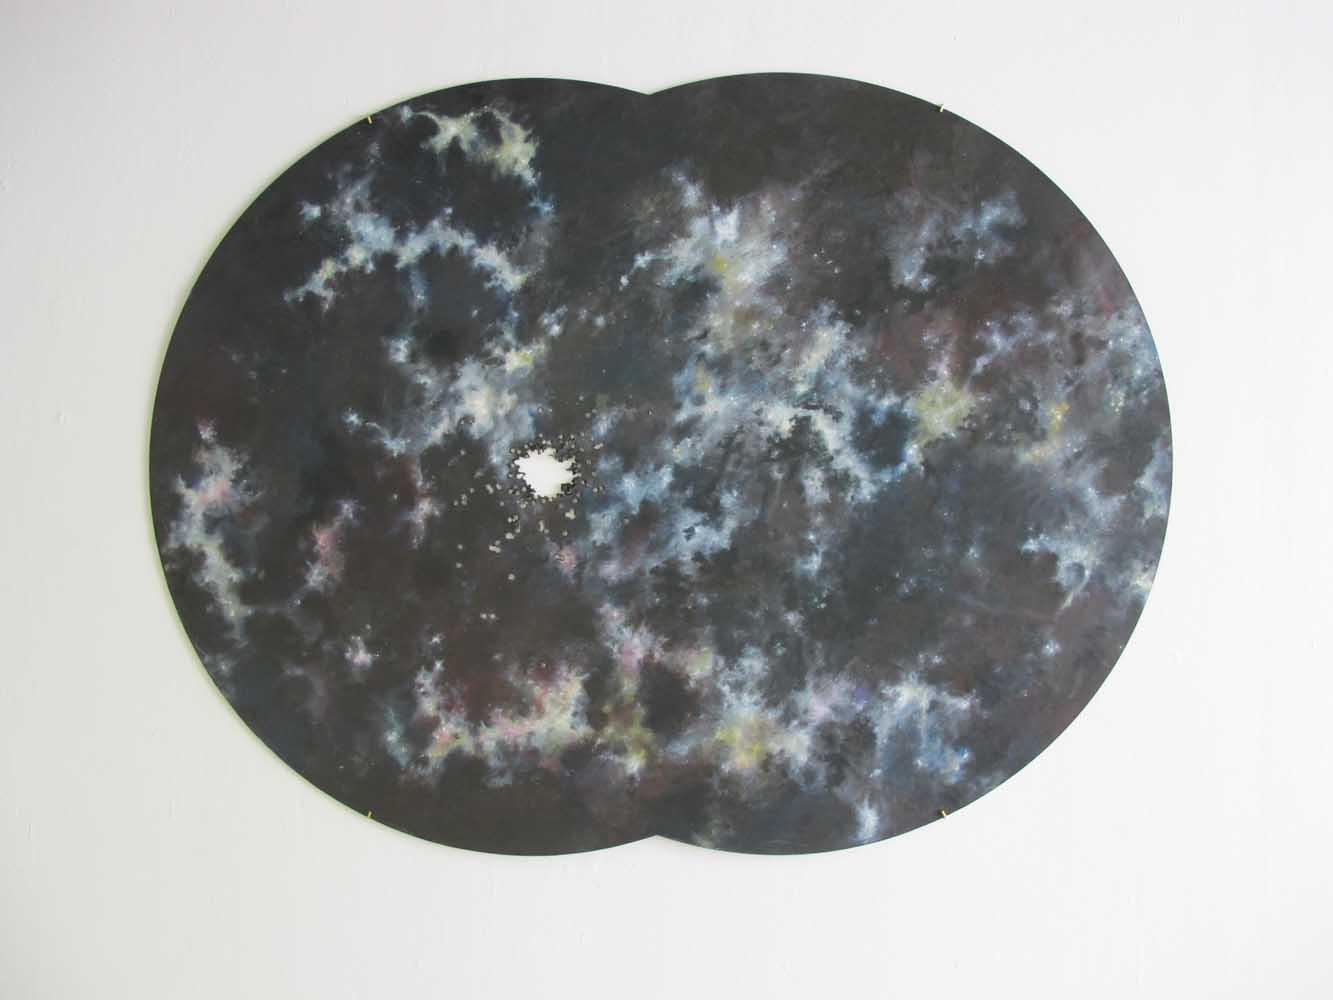 <em>Wounded in the Sky</em>, 2013 <br>dessin marouflé sur bois <br>120 x 160 cm